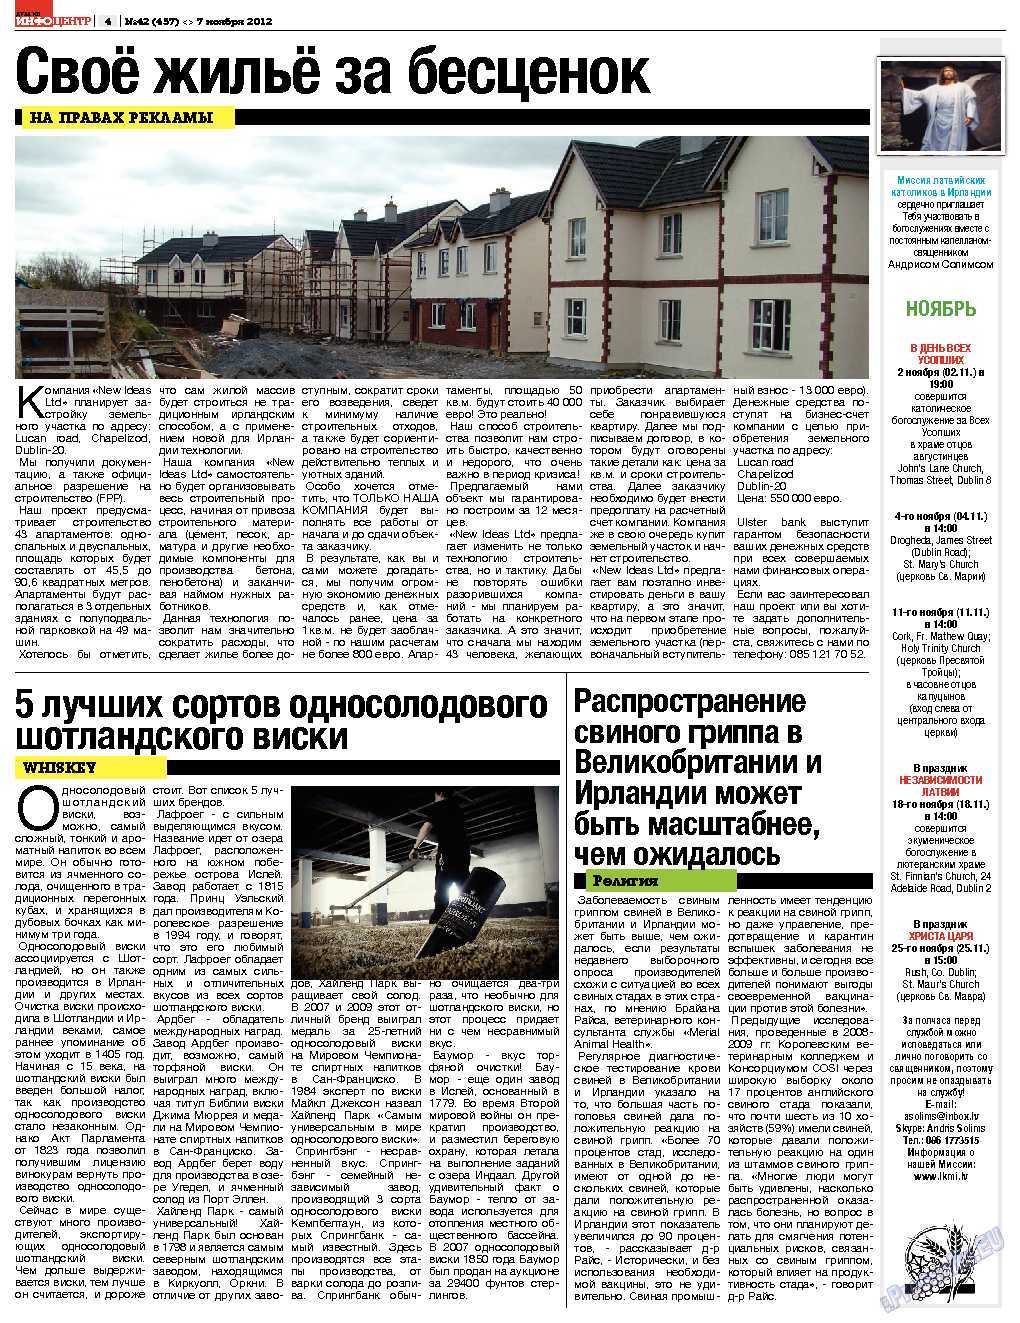 Дублин инфоцентр (газета). 2012 год, номер 42, стр. 4